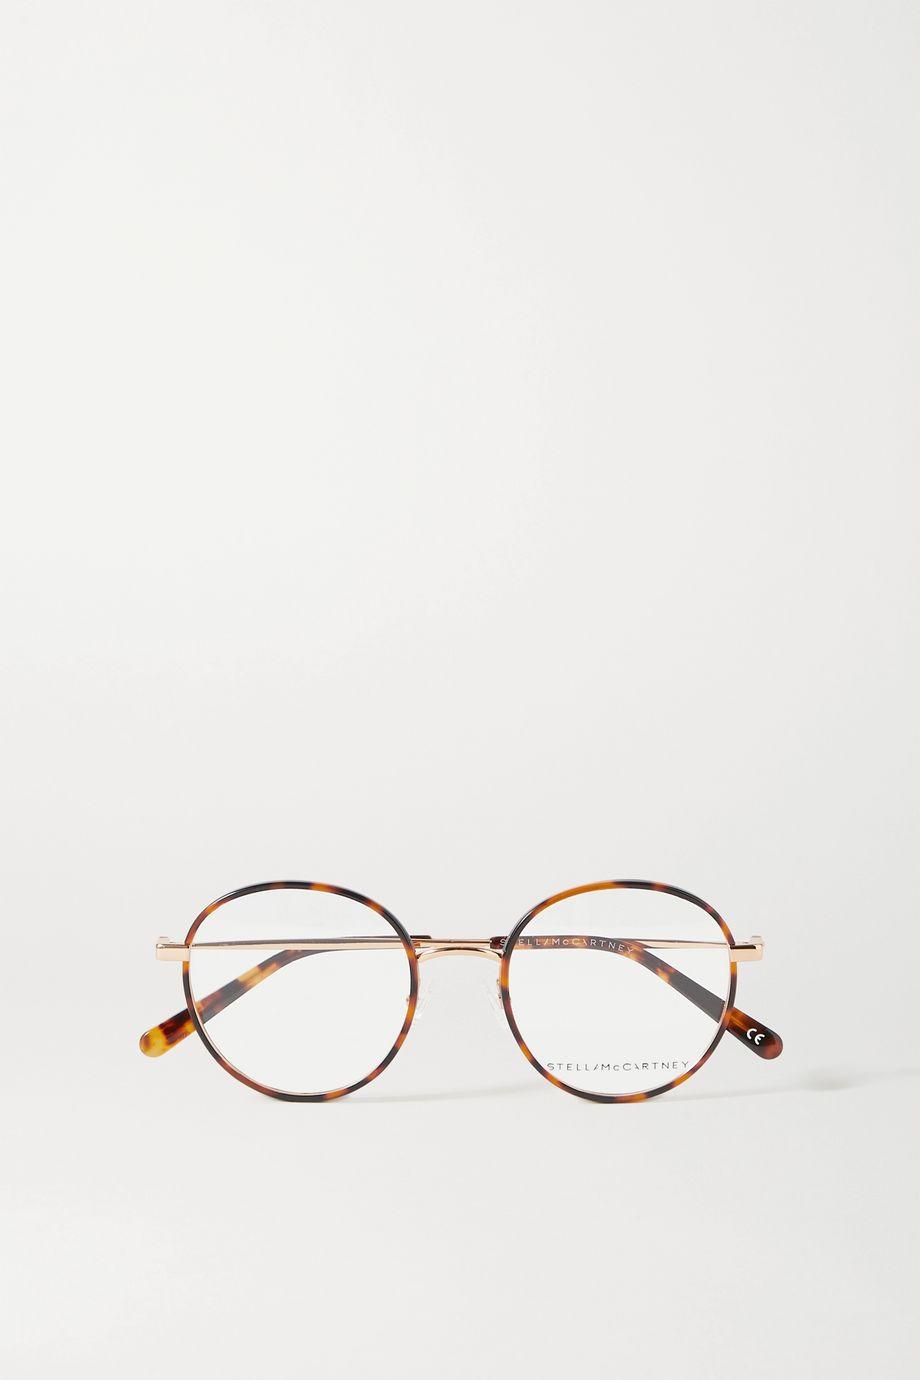 Stella McCartney Round-frame tortoiseshell acetate and gold-tone optical glasses